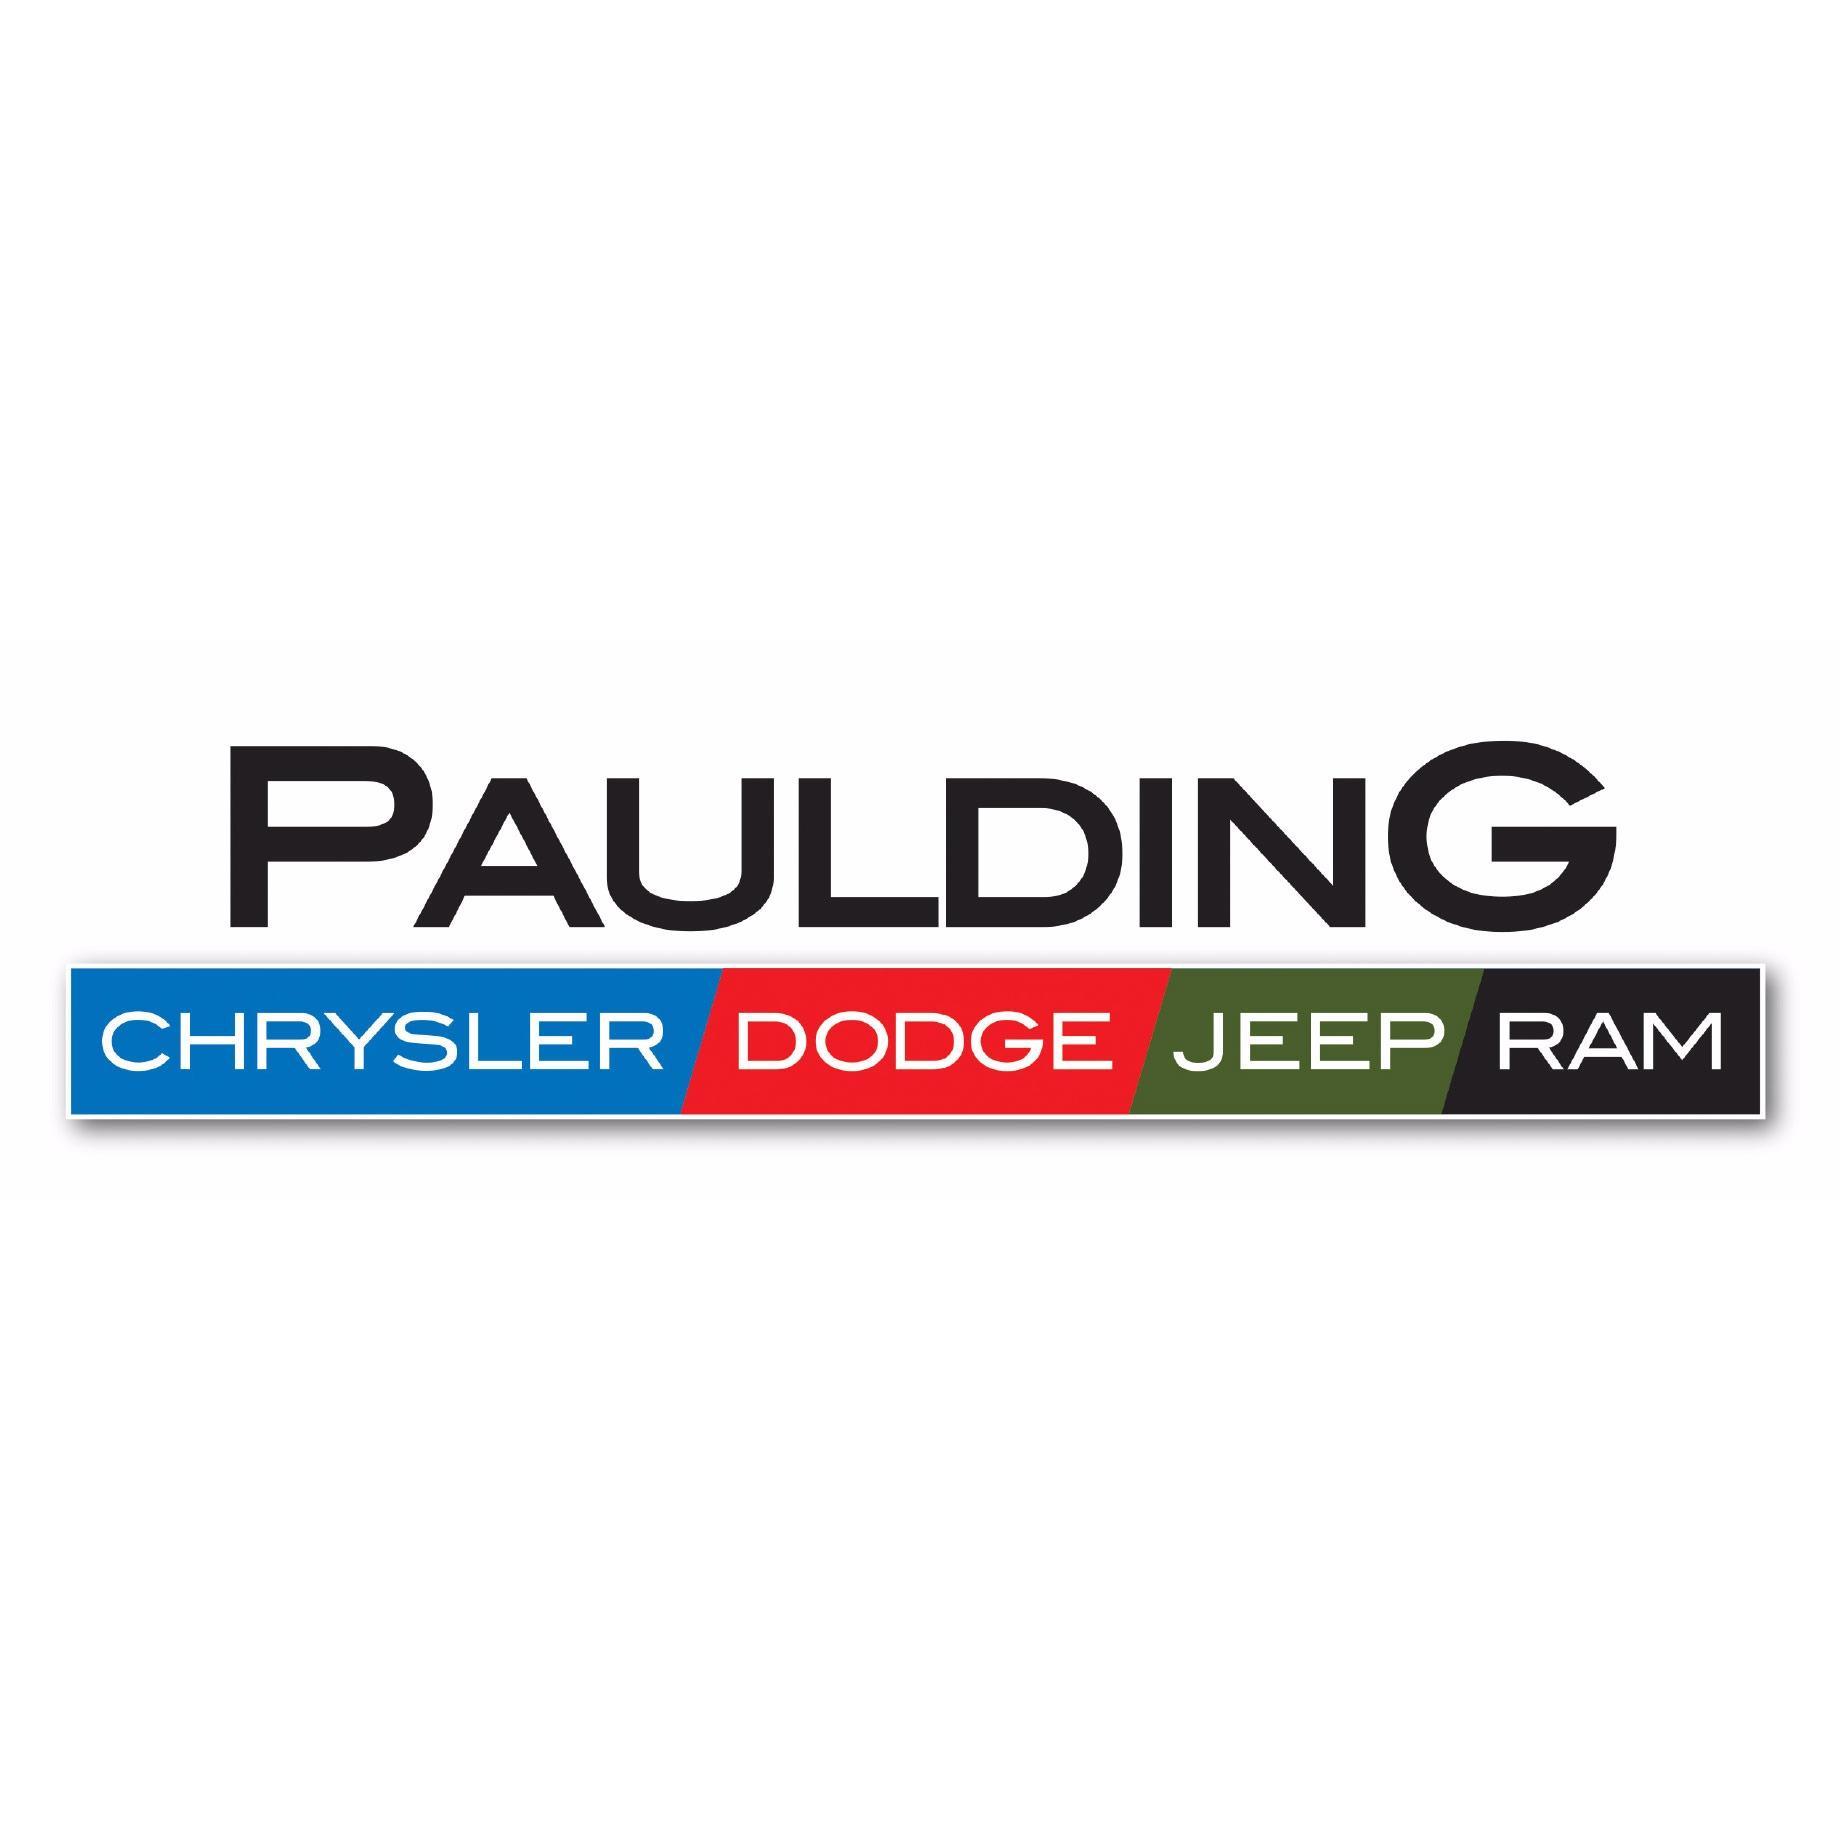 texas business dodge freeway ram mapquest chrysler us lbj jeep tx dallas auto dealers